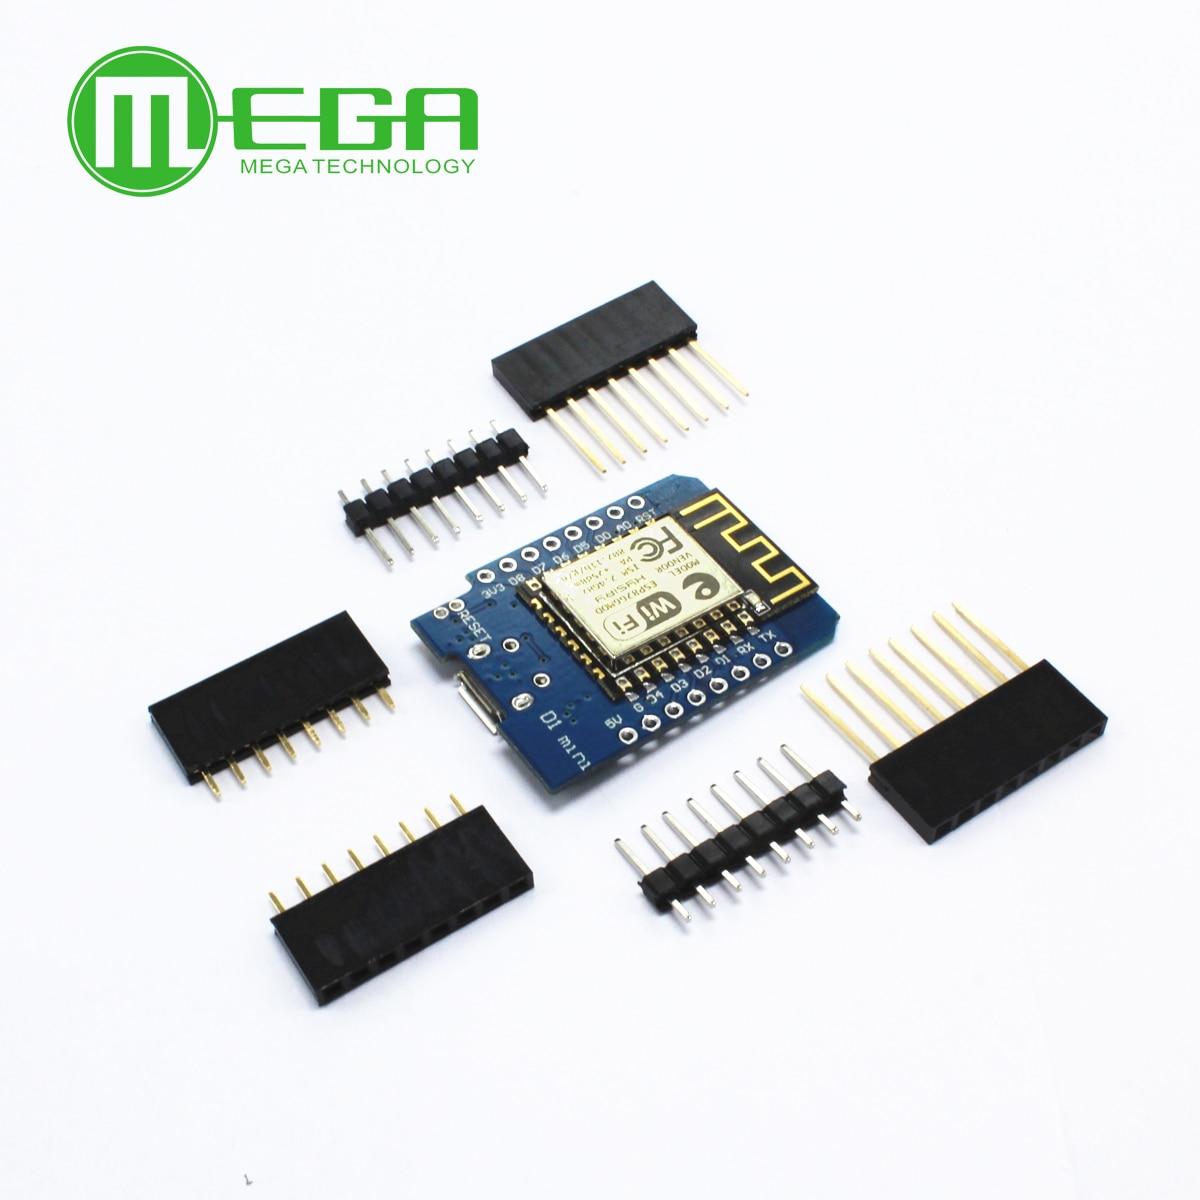 10pcs/LOT D1 mini - Mini NodeMcu 4M bytes Lua WIFI Internet of Things development board based ESP8266